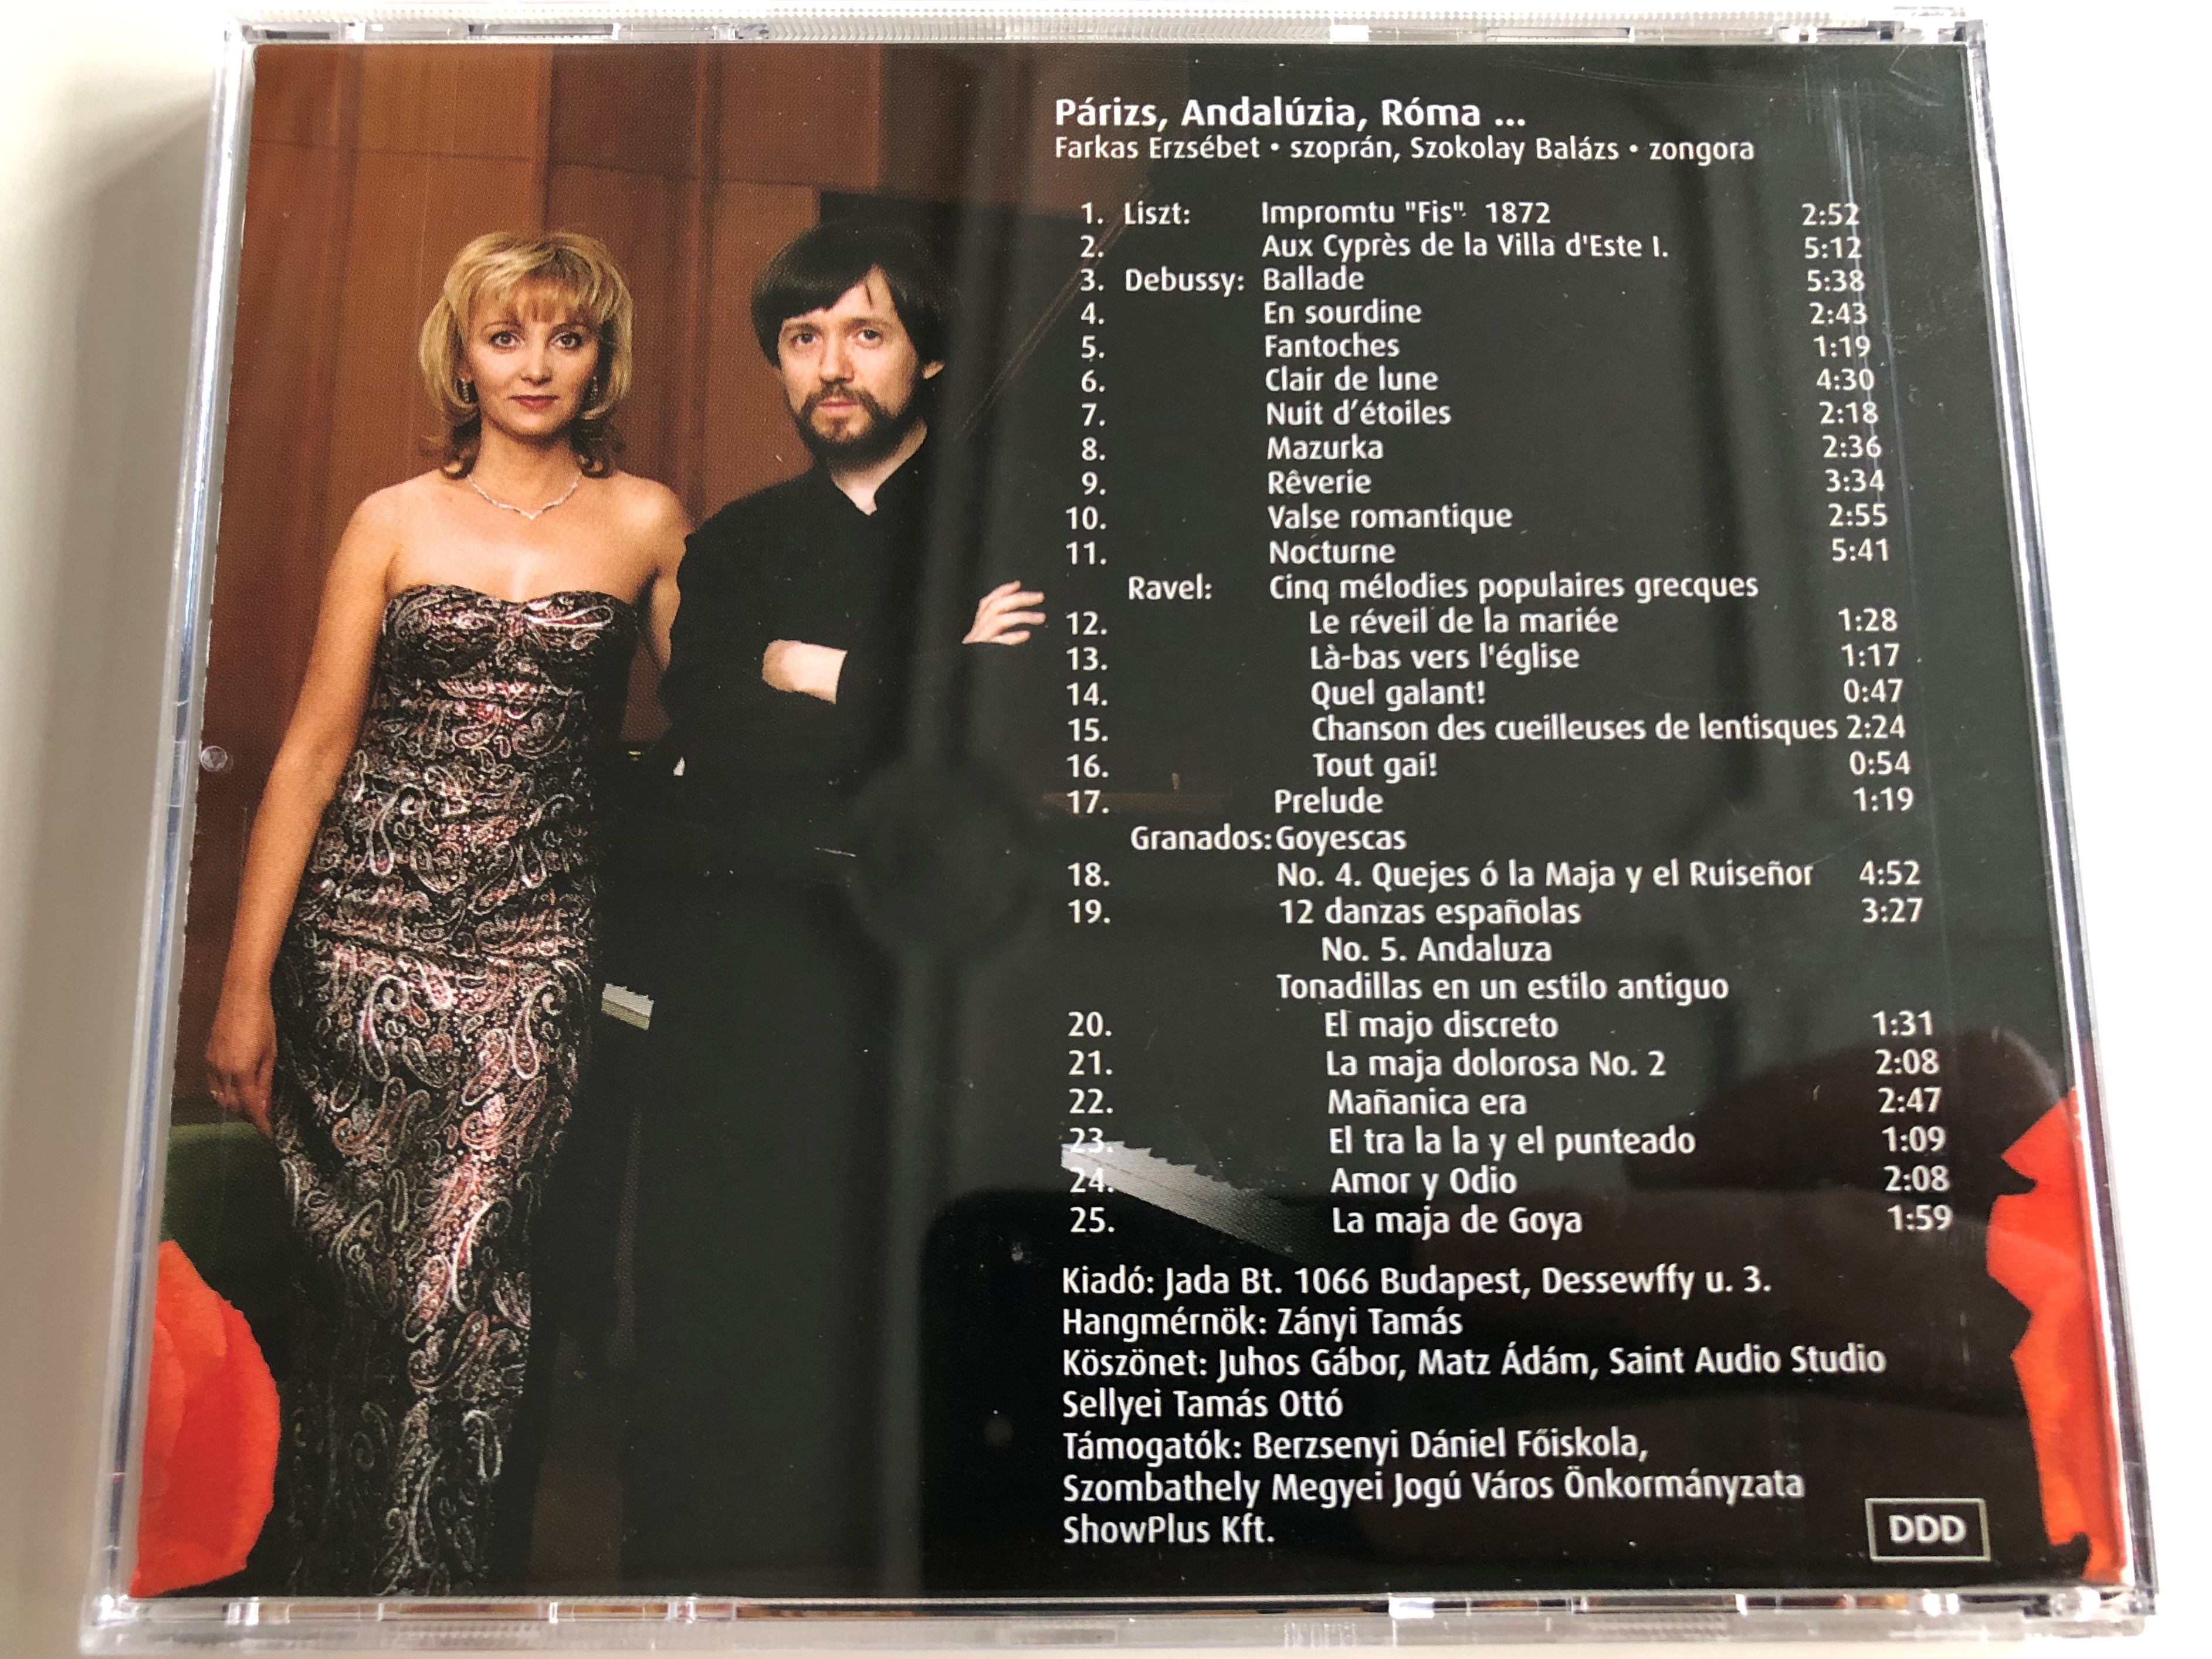 p-rizs-andal-zia-r-ma-farkas-erzs-bet-sopran-szokolay-bal-zs-piano-audio-cd-tomkin-031-8-.jpg